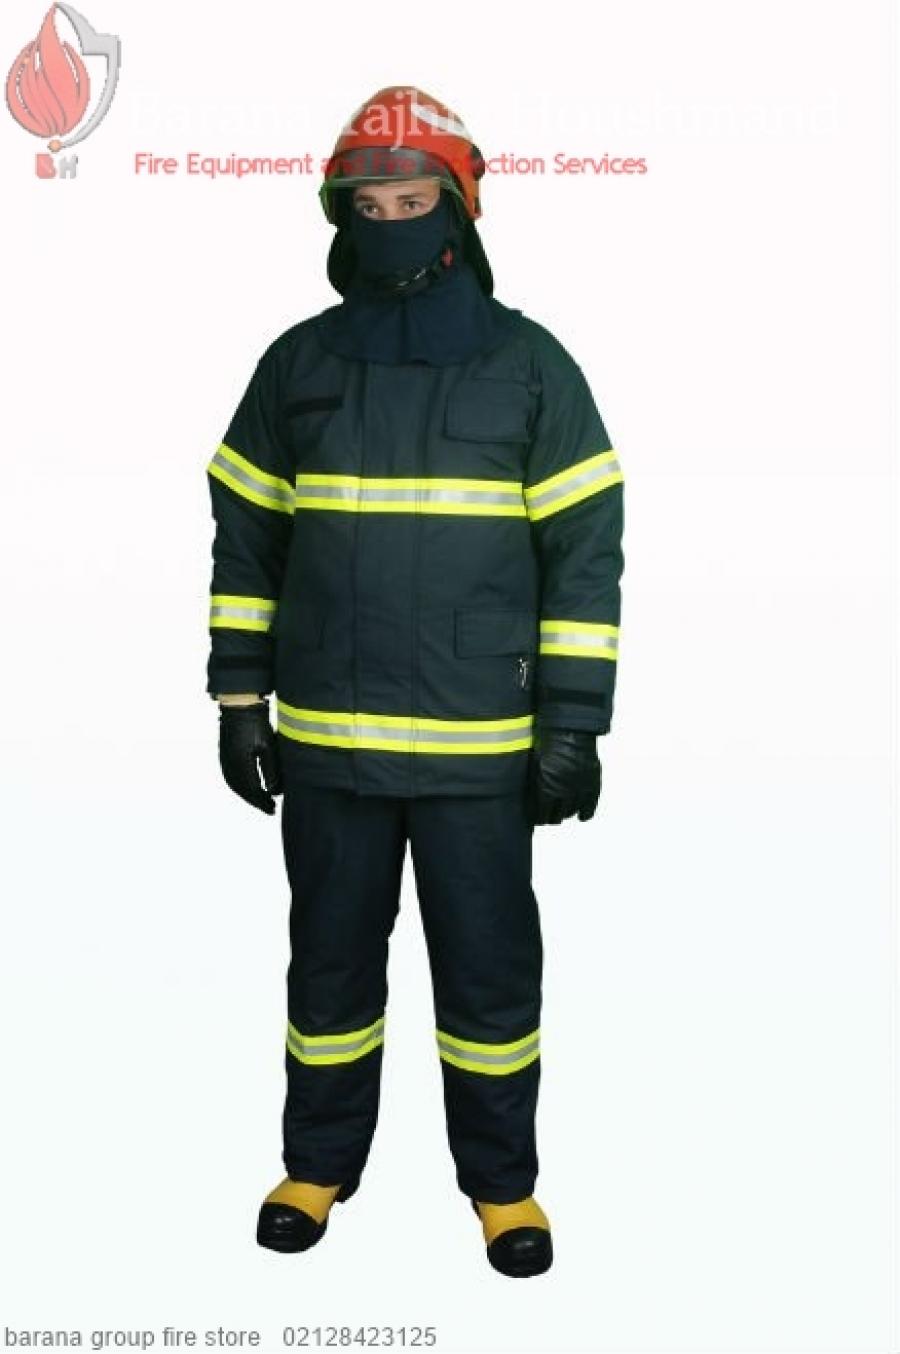 لباس عملياتي مبارزه با حريق مدل FYRPRO 440